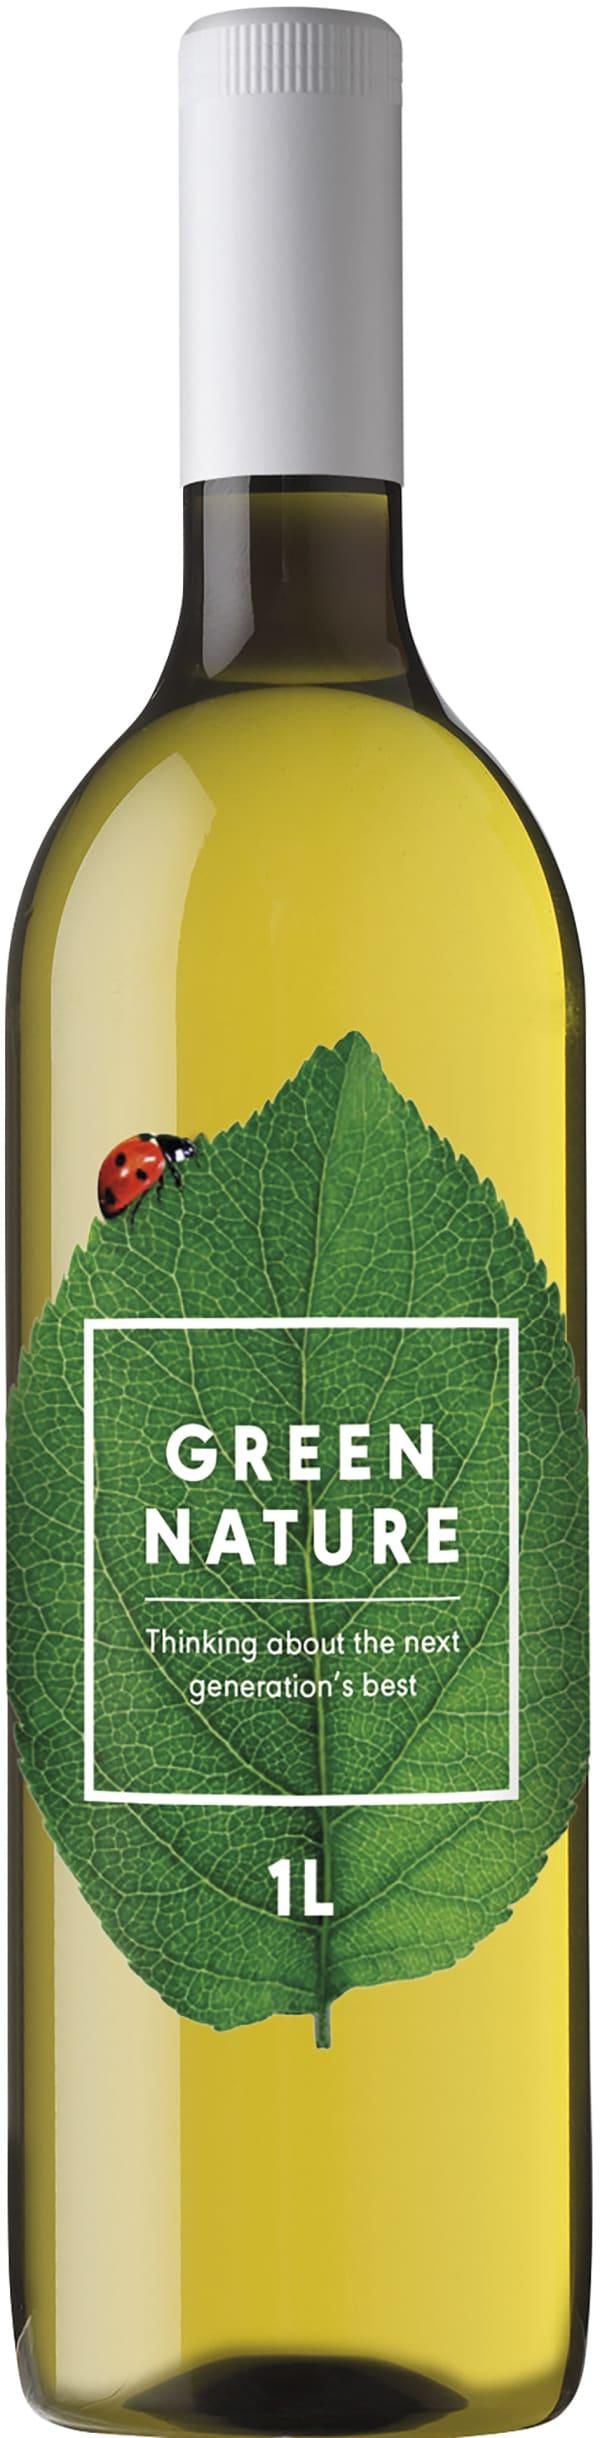 Green Balance 2014 plastic bottle